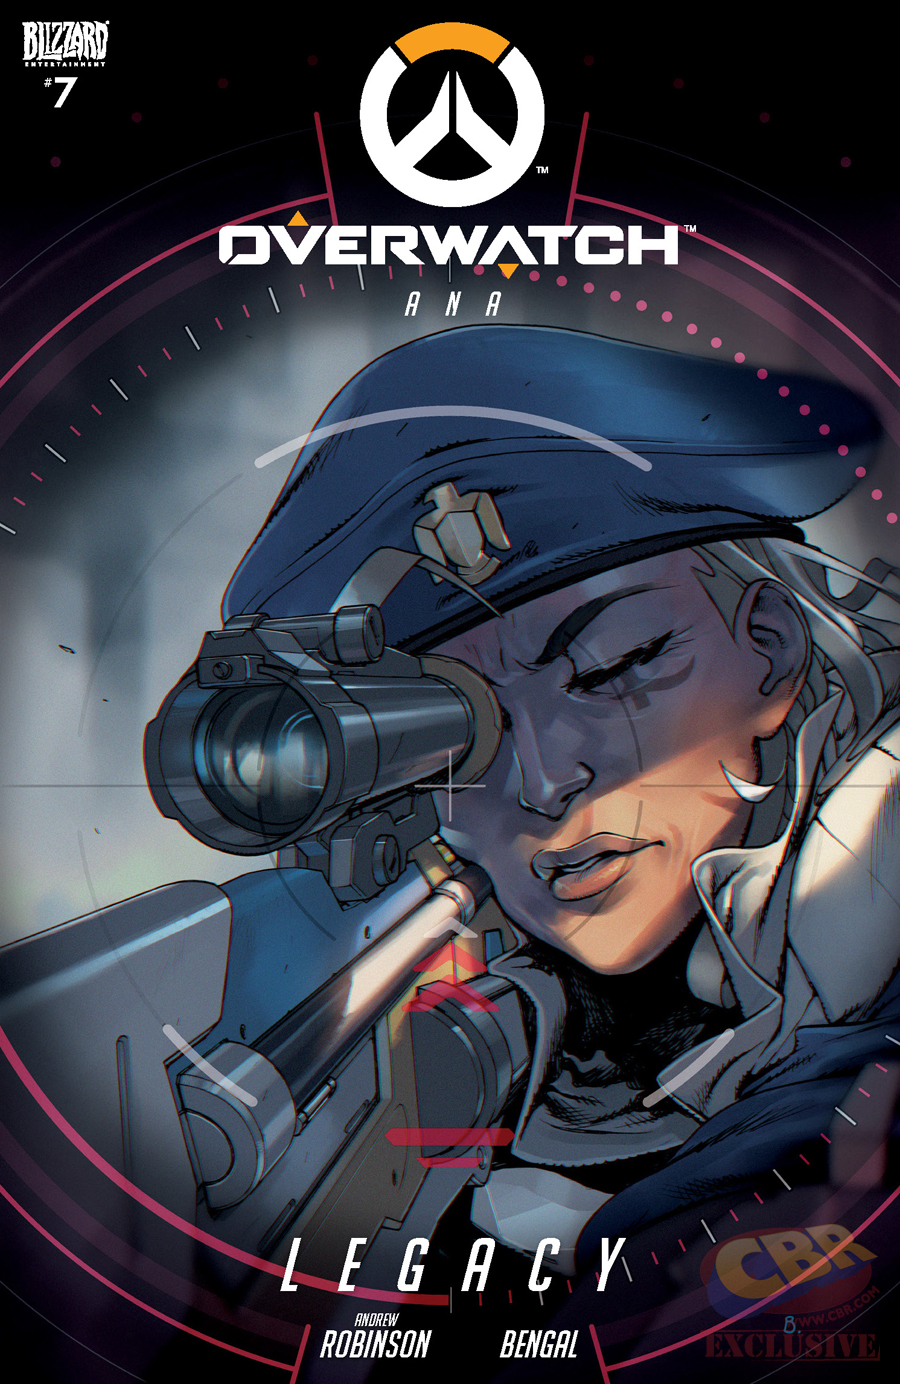 Overwatch Hanzo Wallpaper Iphone Overwatchers Overwatch Brasil Ana Comic Overwatchers